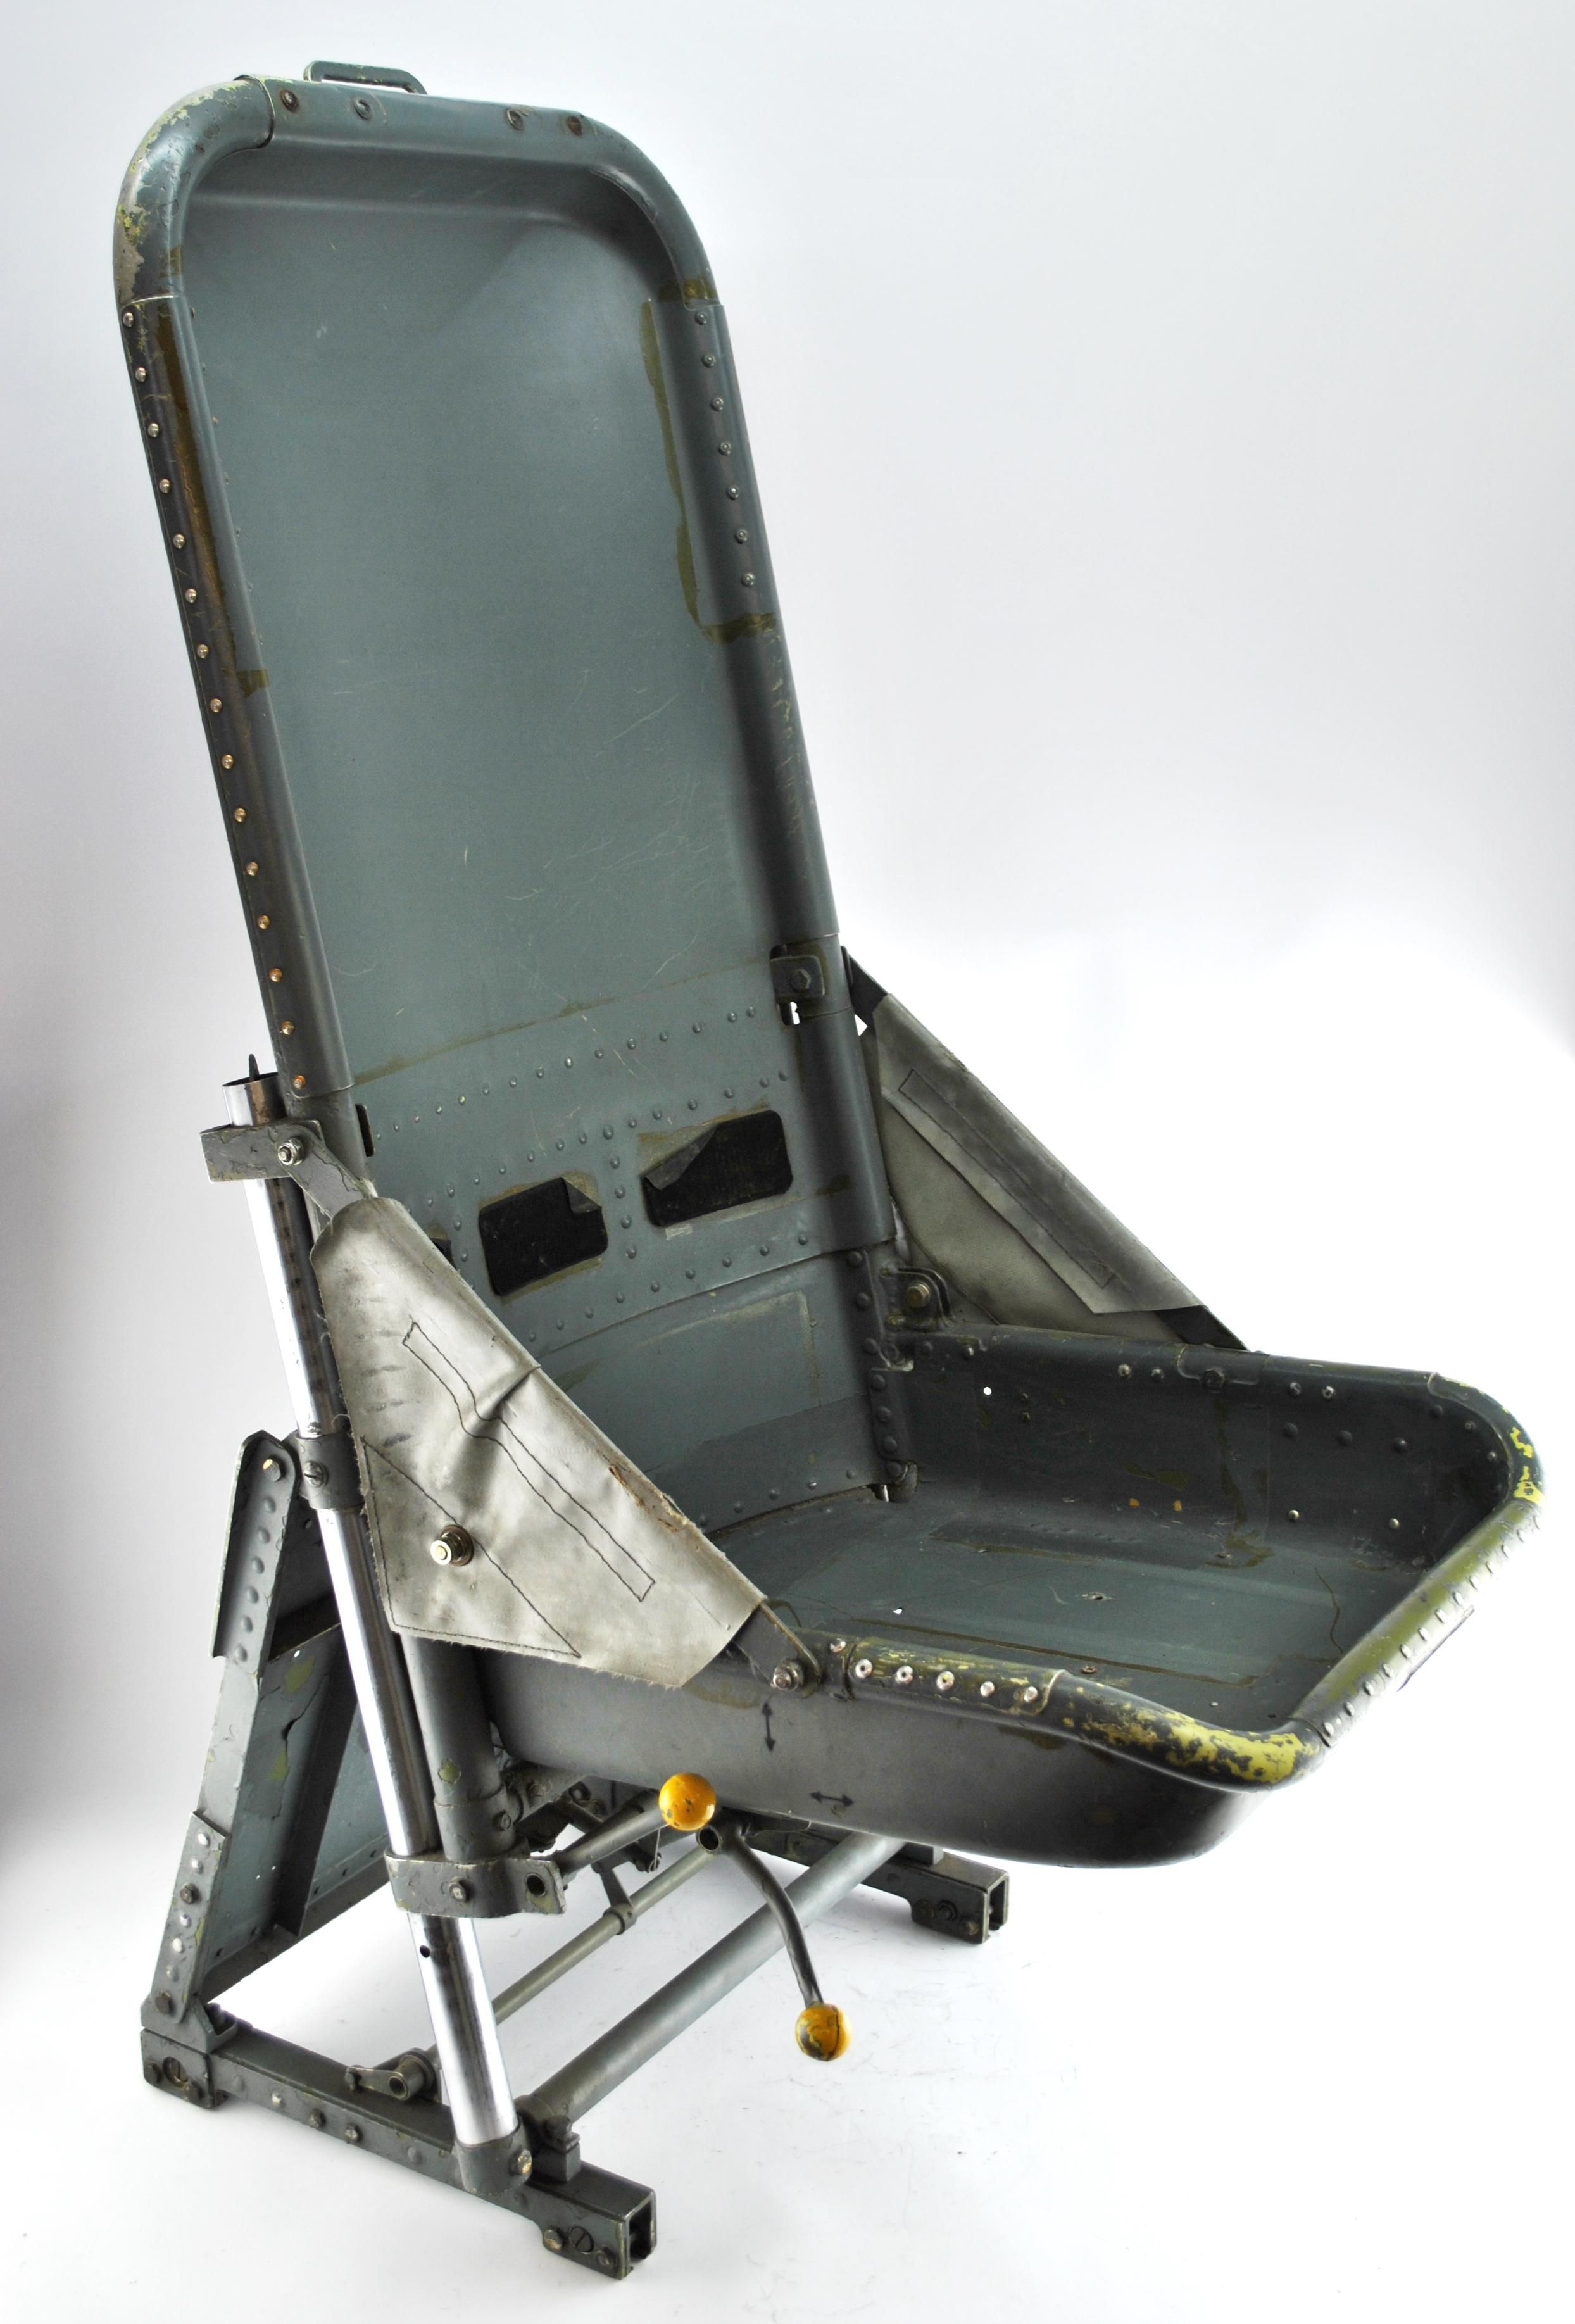 Seaking Crew seat